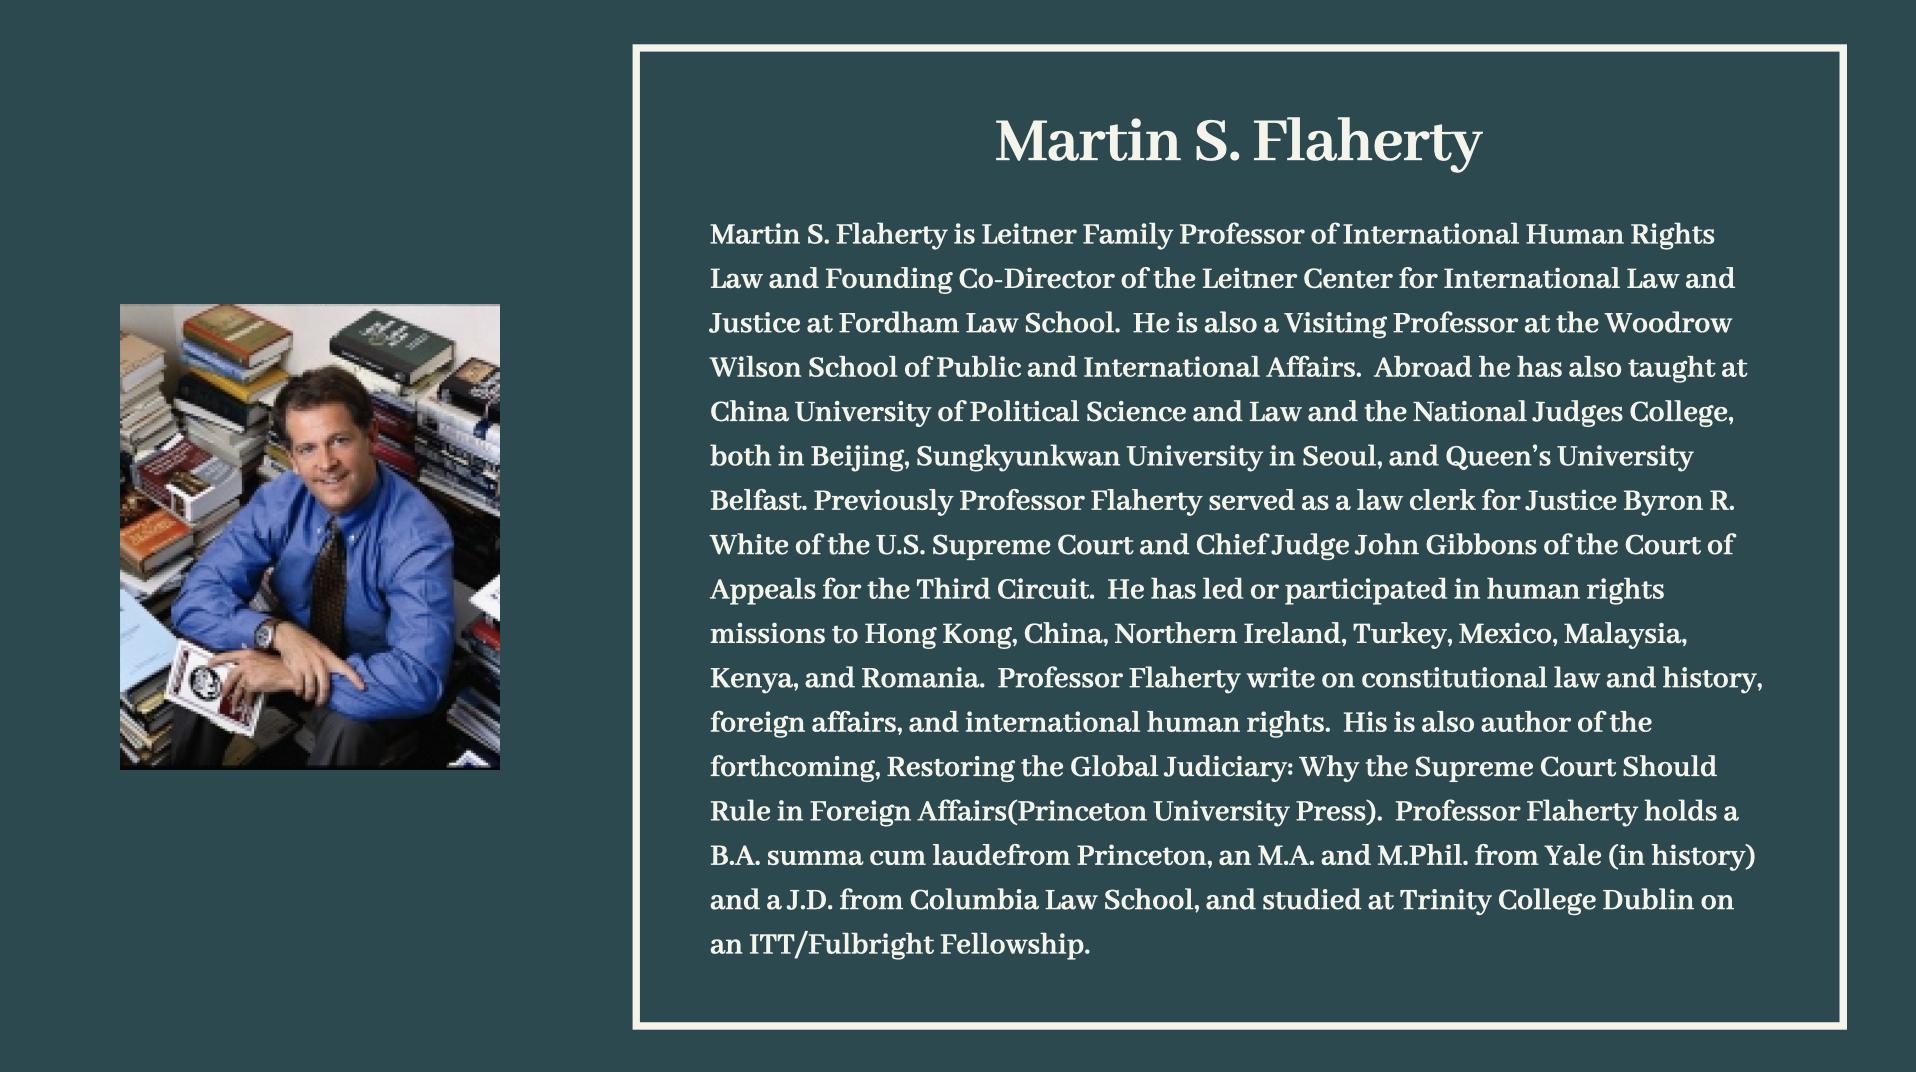 MartinFlahertyBio.png